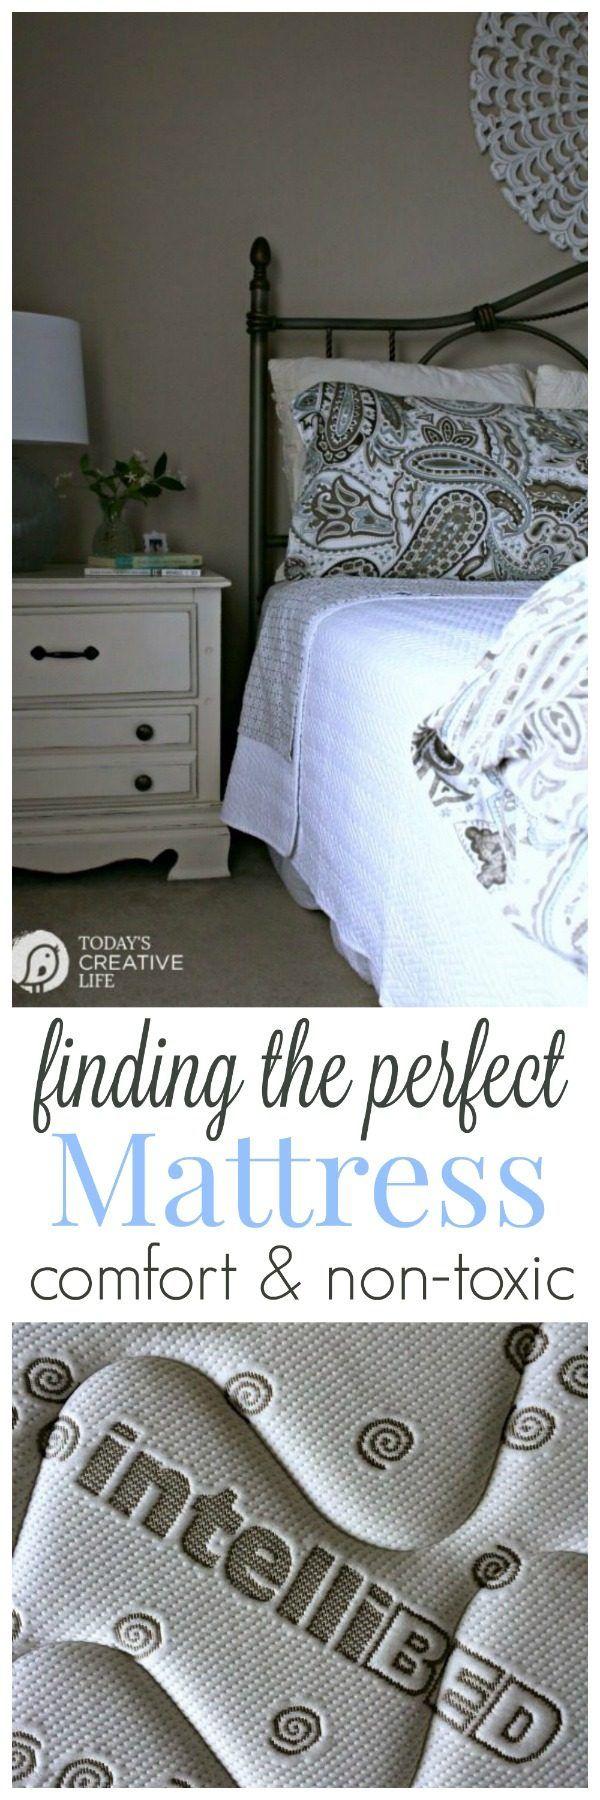 best 25 best mattress ideas on pinterest back pain exercises yoga for back pain and how to start yoga